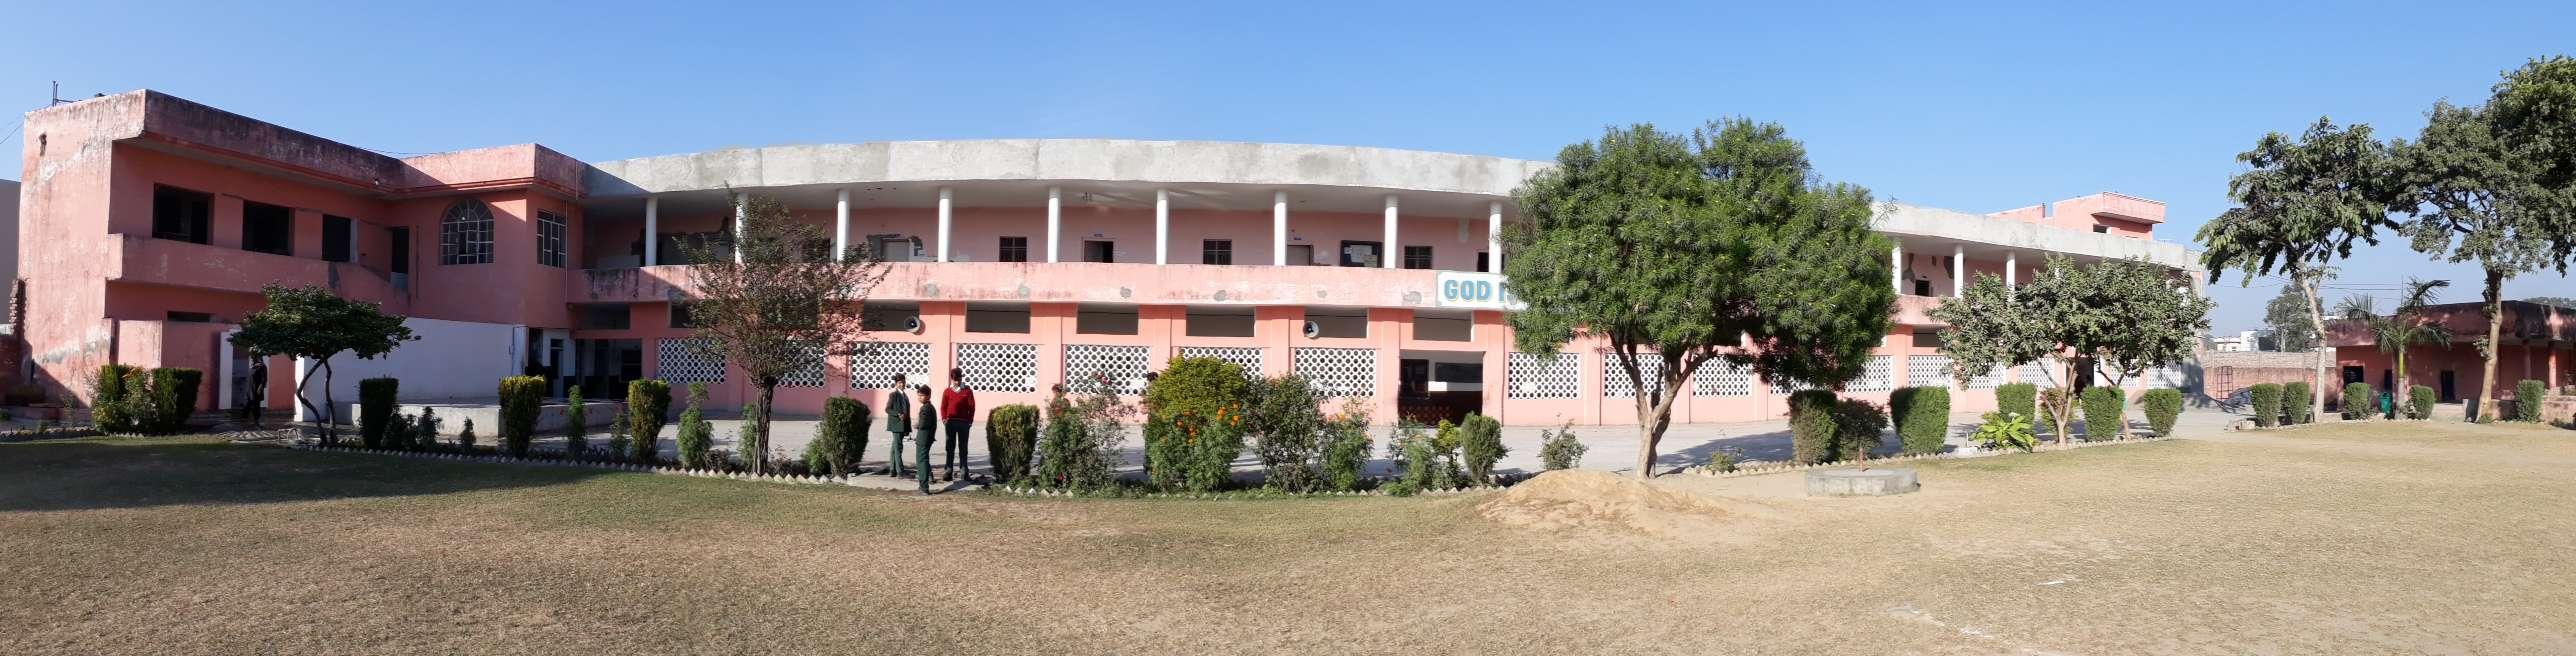 BHAGWAN PARSHURAM PUBLIC SCHOOL AMBALA ROAD JAGADHRI DISTT YAMUNA NAGAR HARYANA 530259